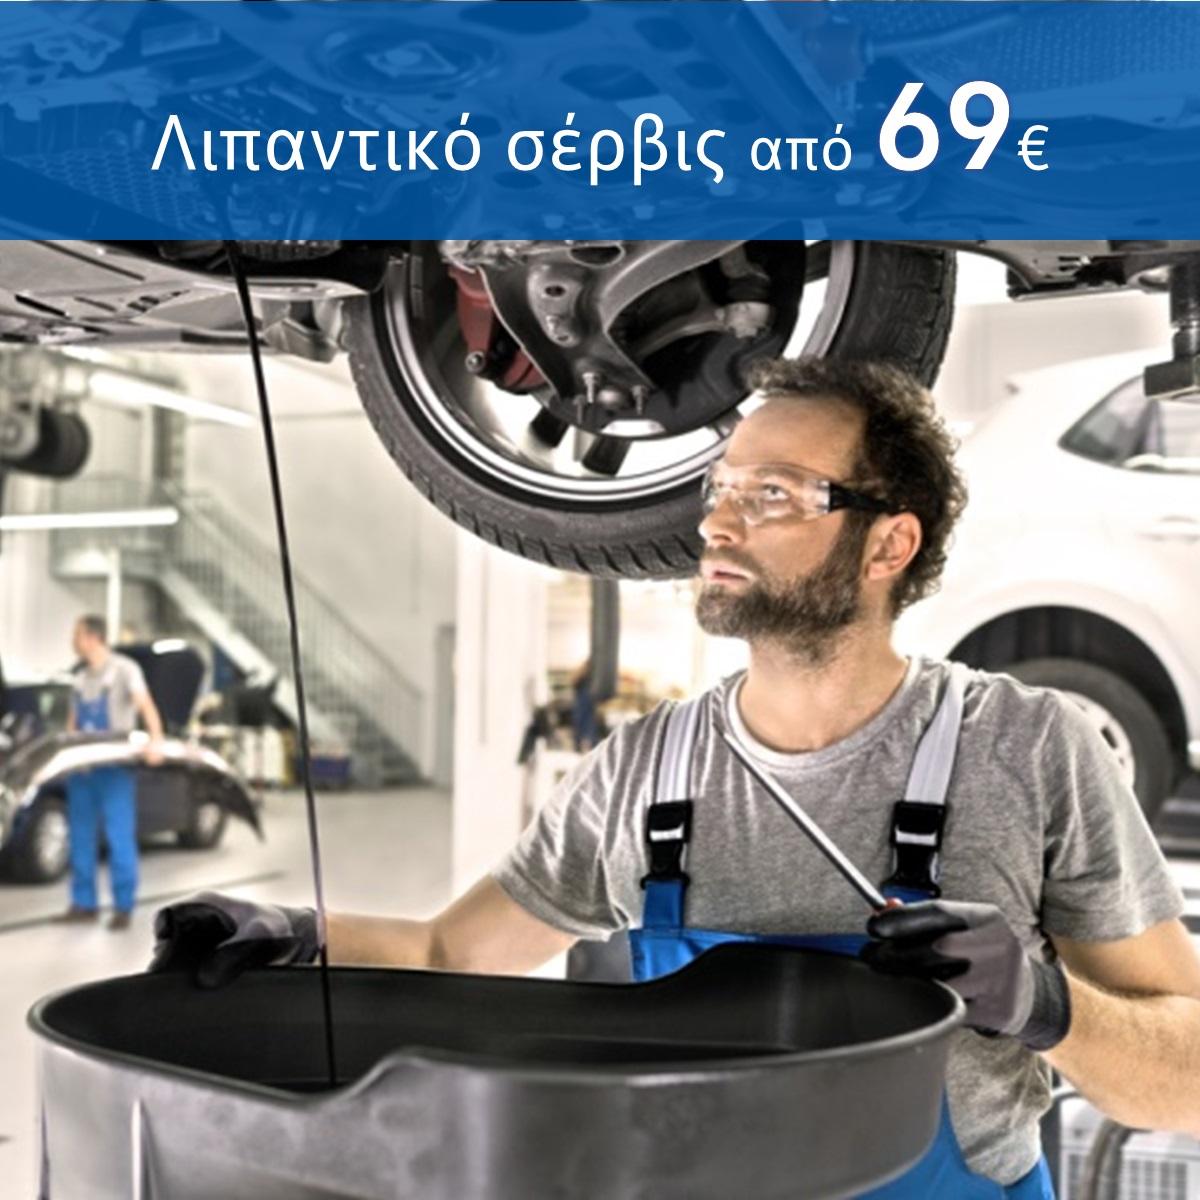 Volkswagen Service - Λιπαντικό σέρβις από 69€